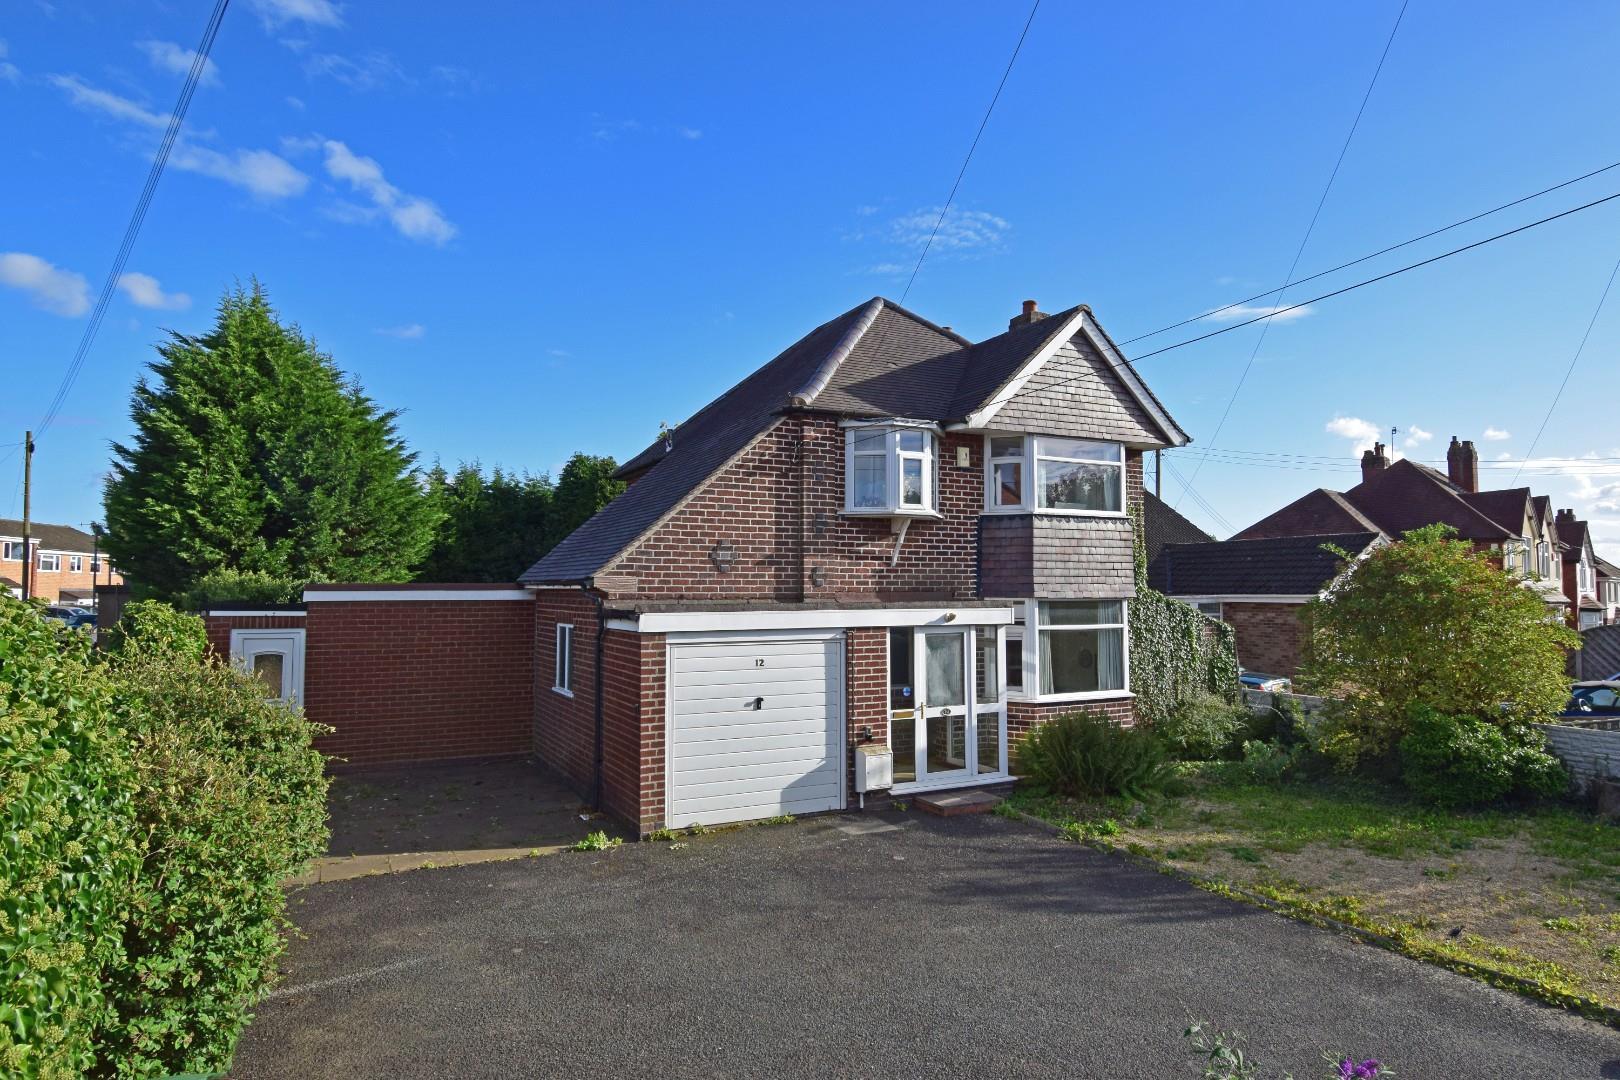 12 Woodrow Lane, Catshill, Worcestershire, B61 0PS